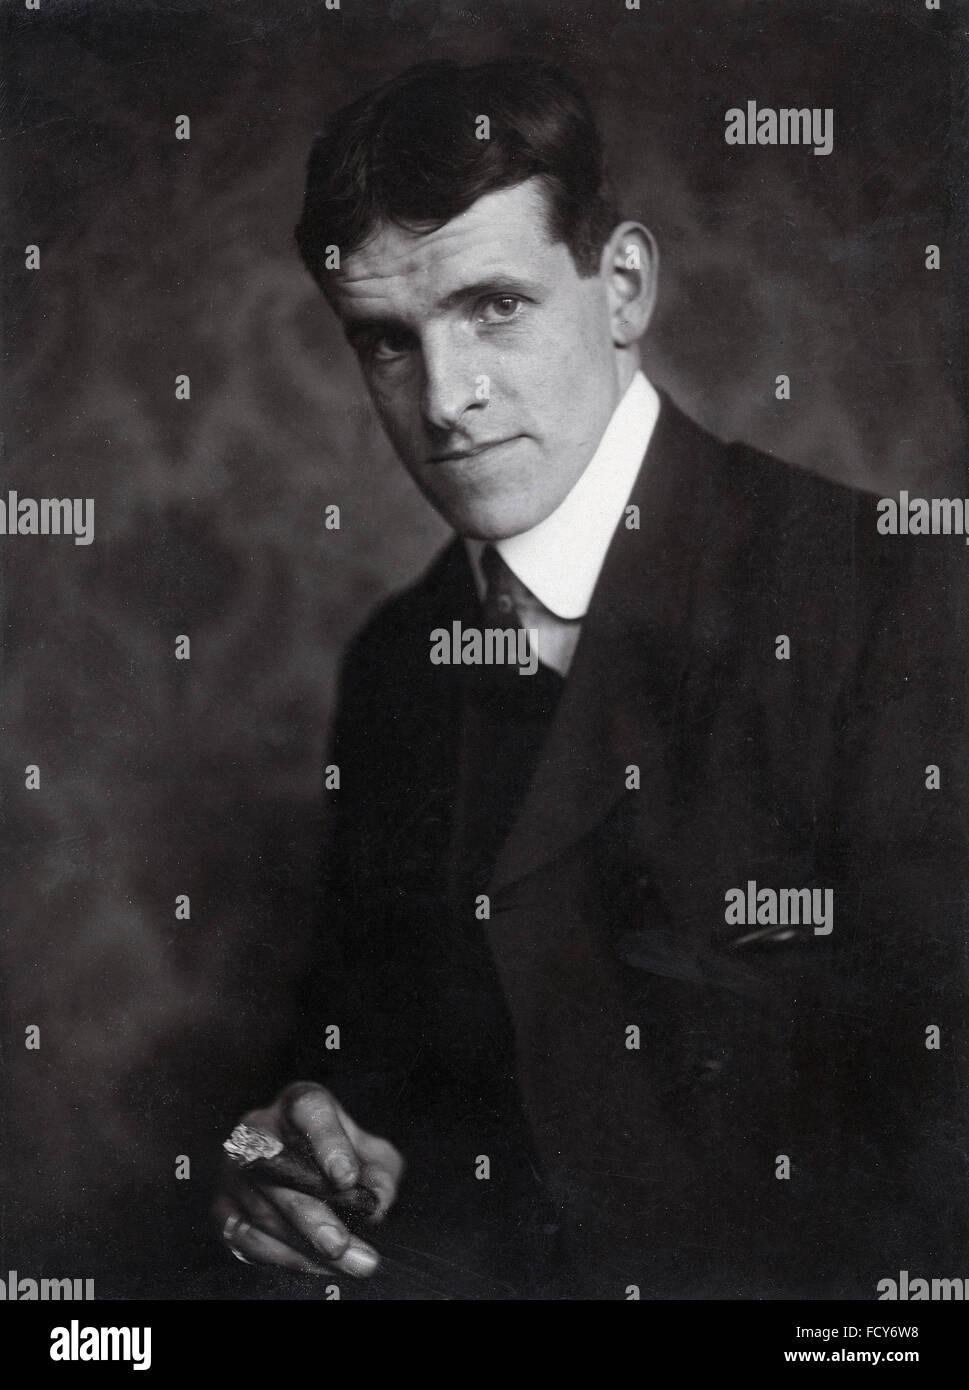 Portrait of Jack Butler Yeats - Stock Image